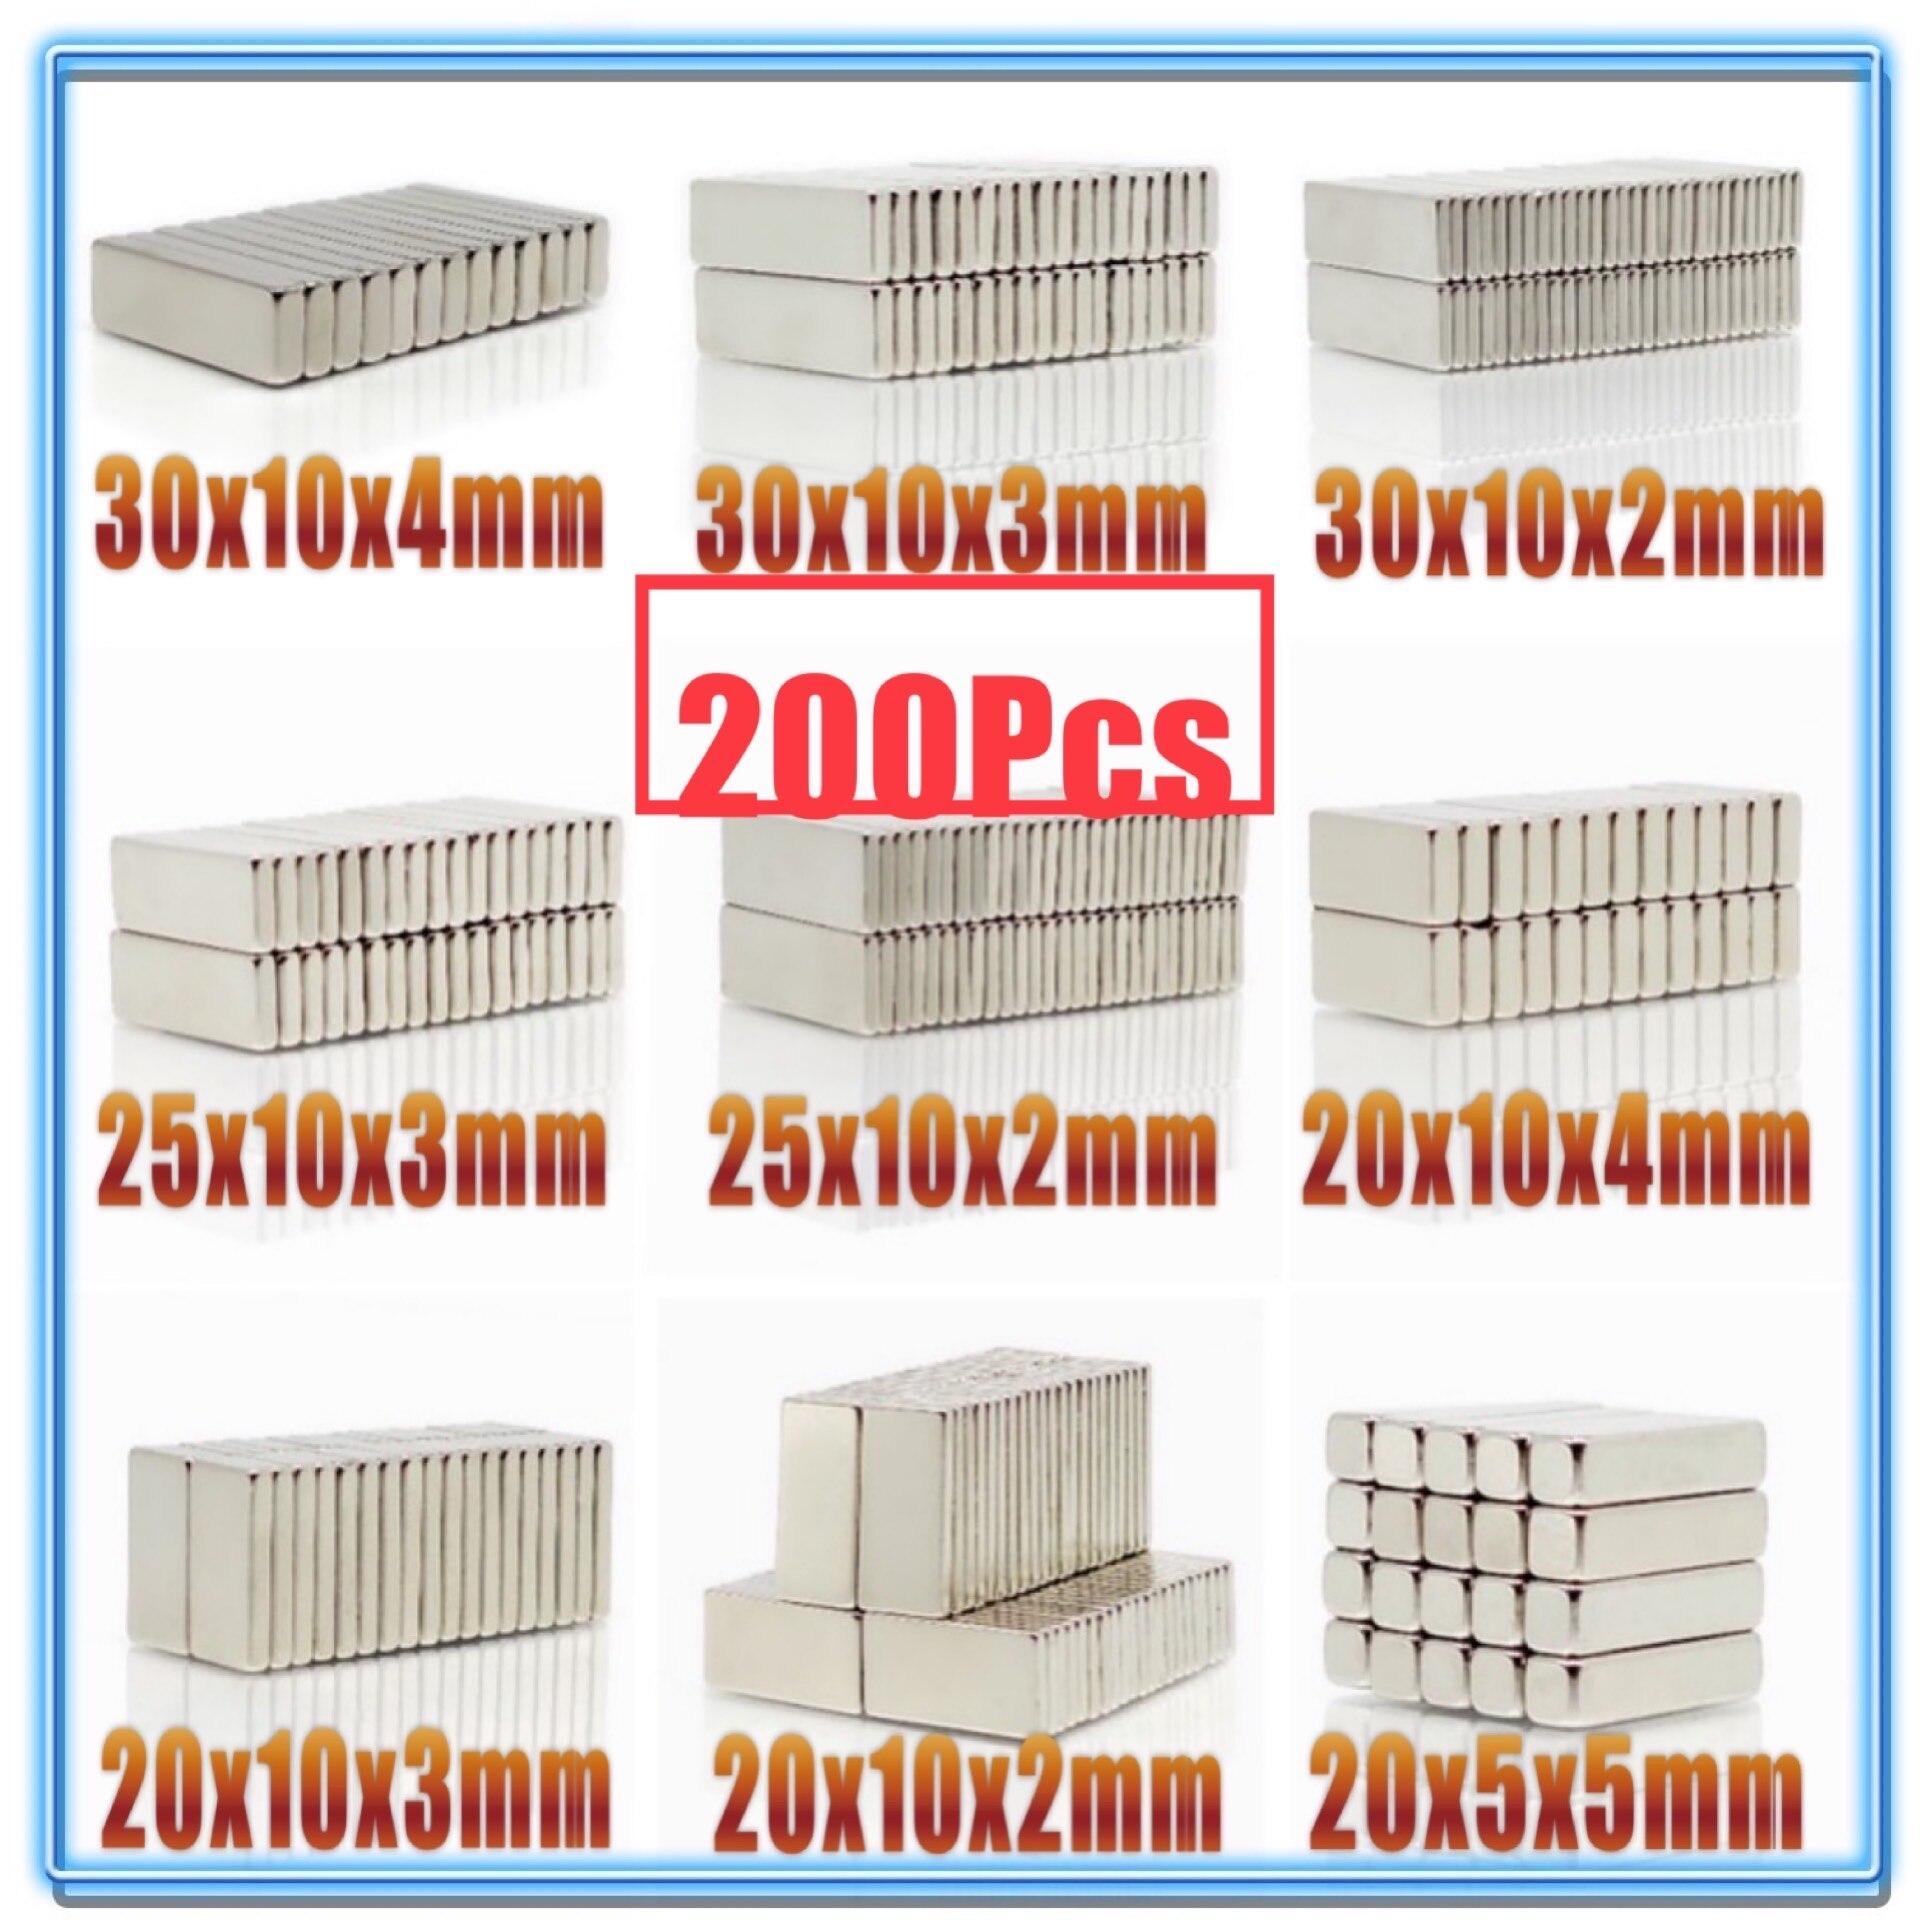 Bloc magnétique néodyme N35 200 pièces   20X10X2 20X10X2 20X10X3 20X10X4 20X10X5 25X10X3 30X10X2 30x10x4 20xx2mm